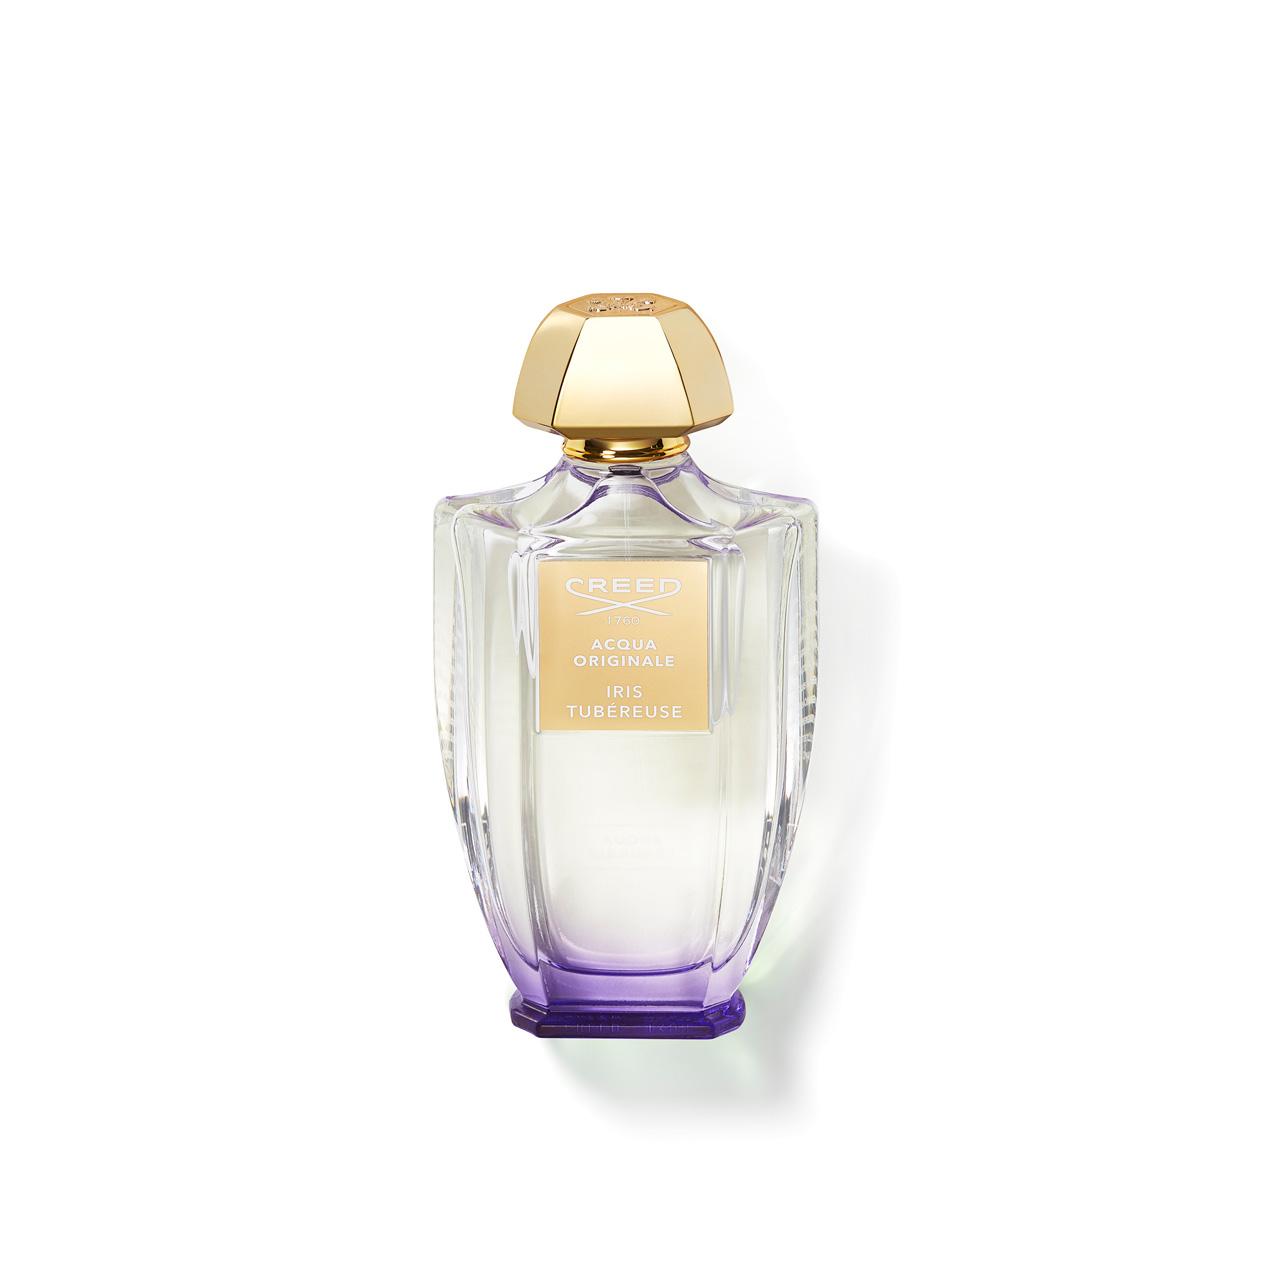 Iris Tubereuse - Acqua Originale - Eau de Parfum